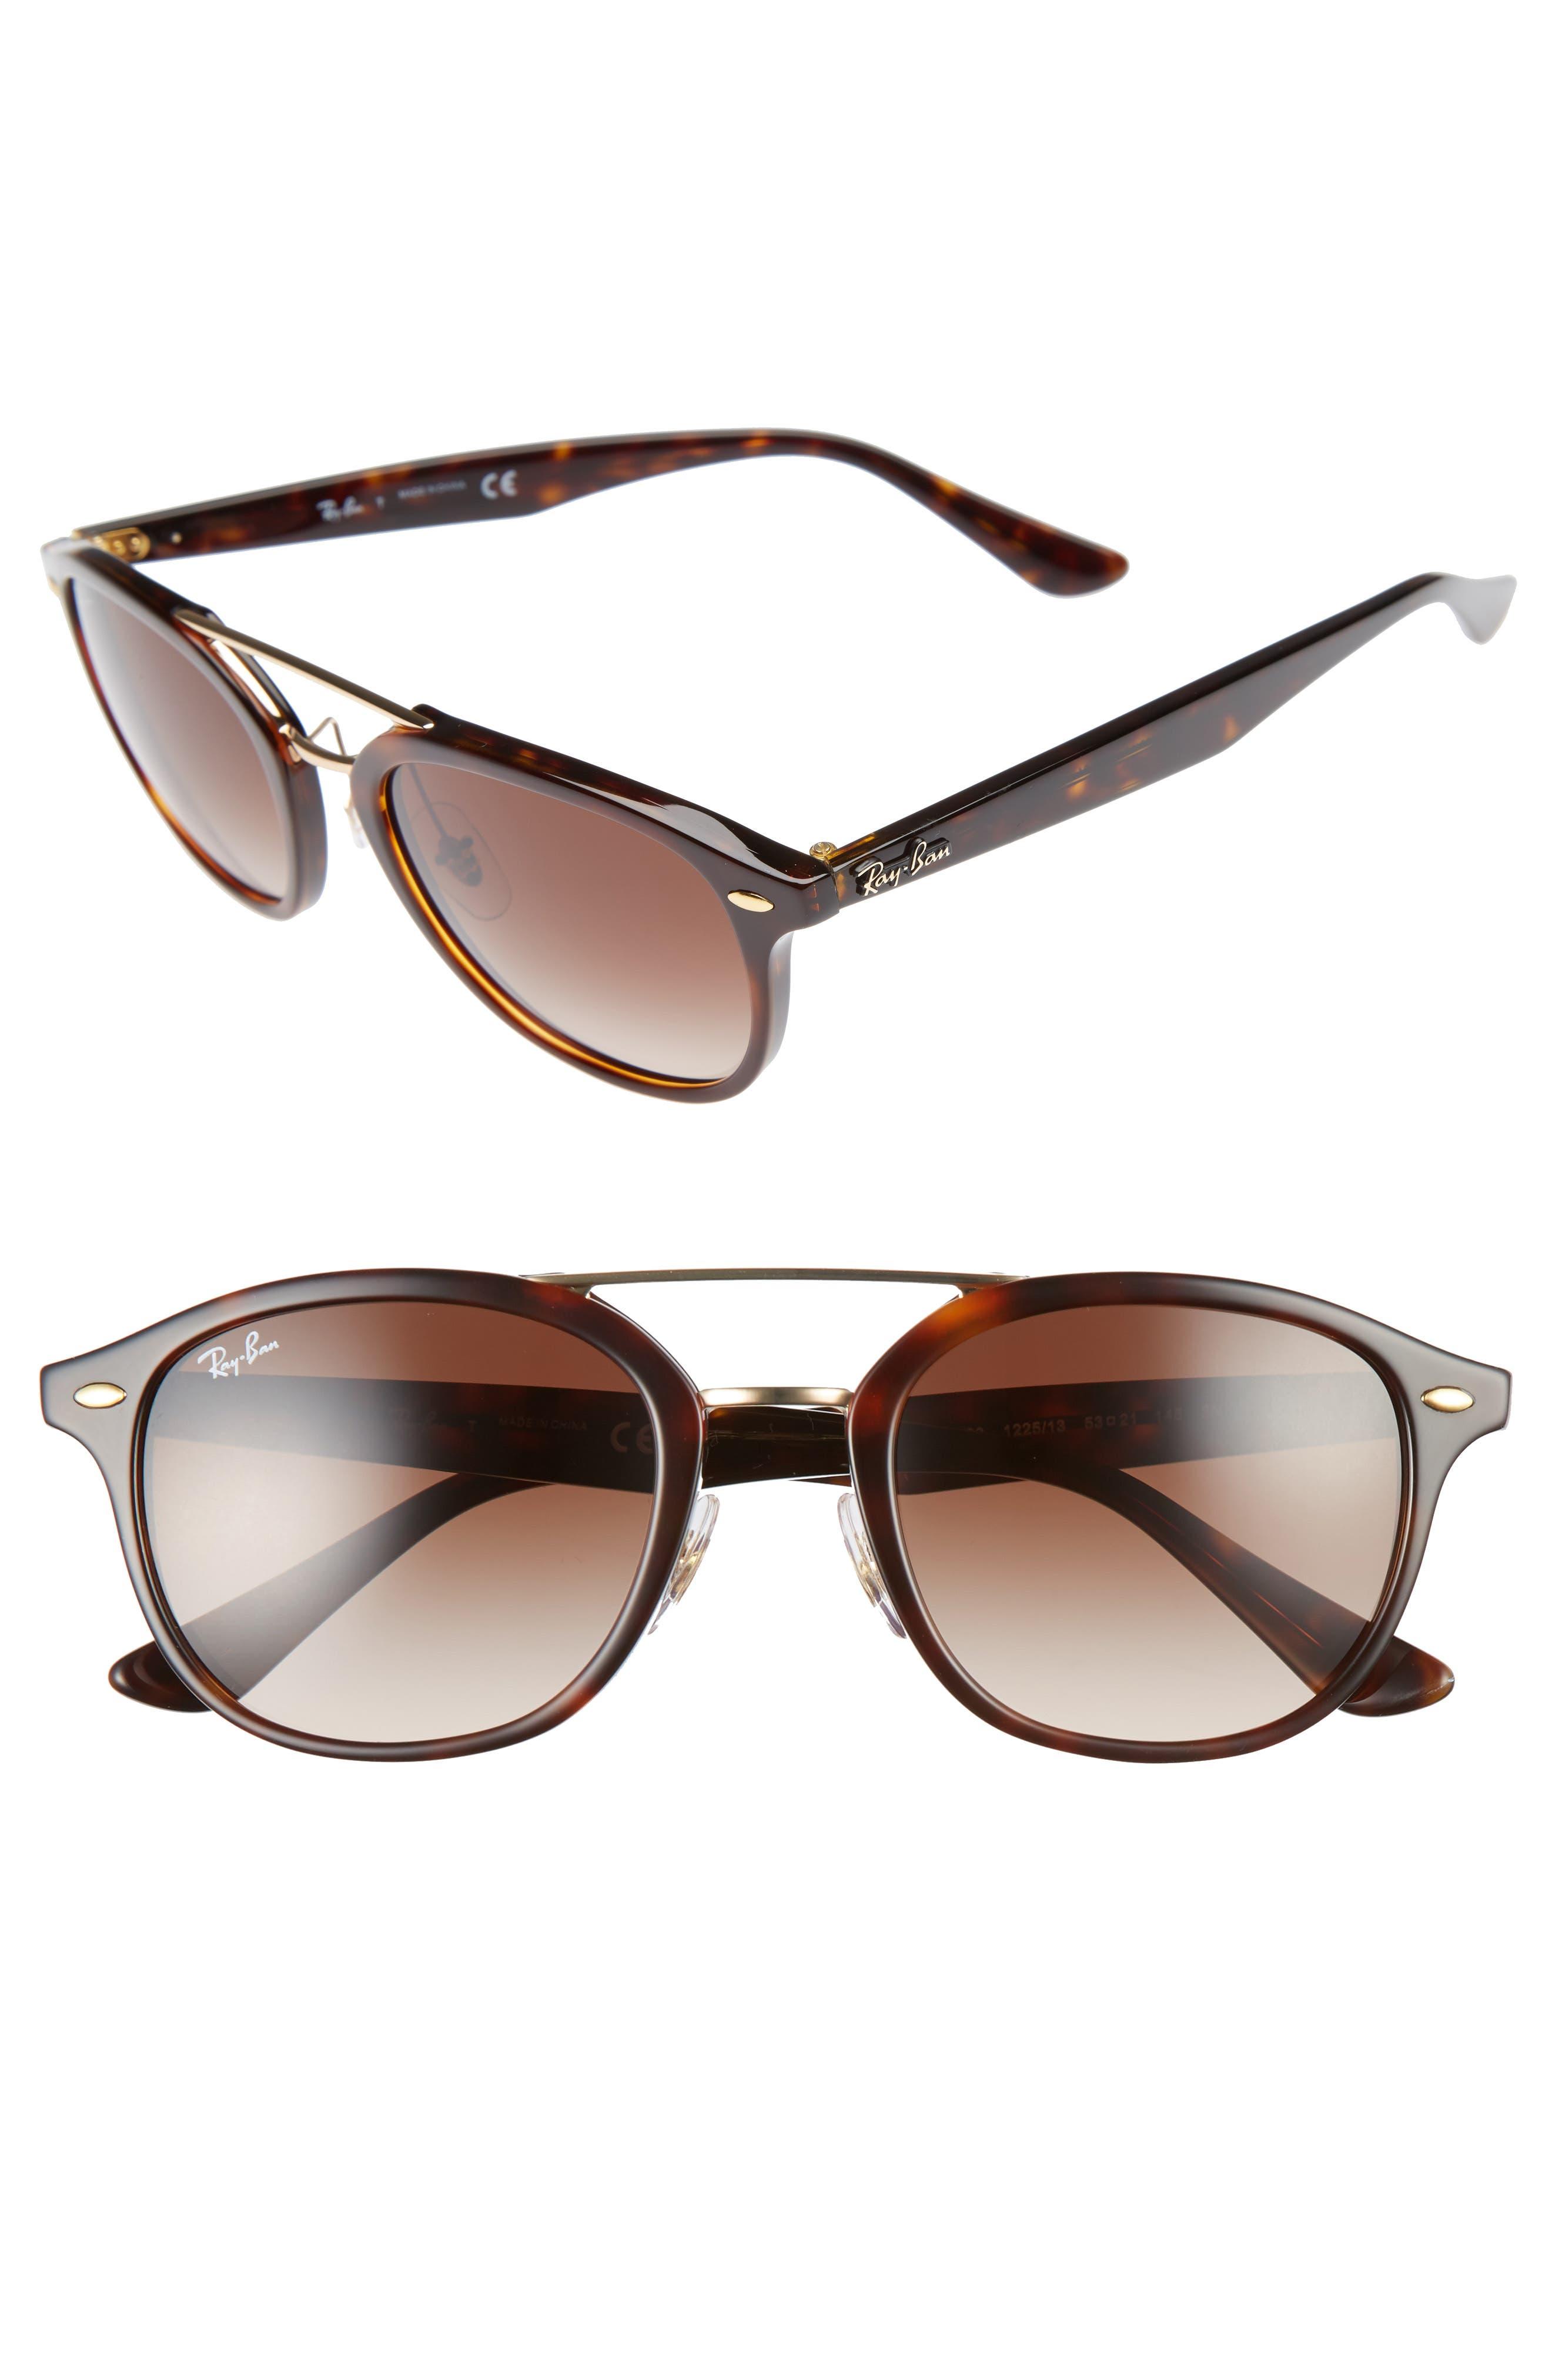 Ray-Ban Highstreet 5m Gradient Lens Sunglasses -